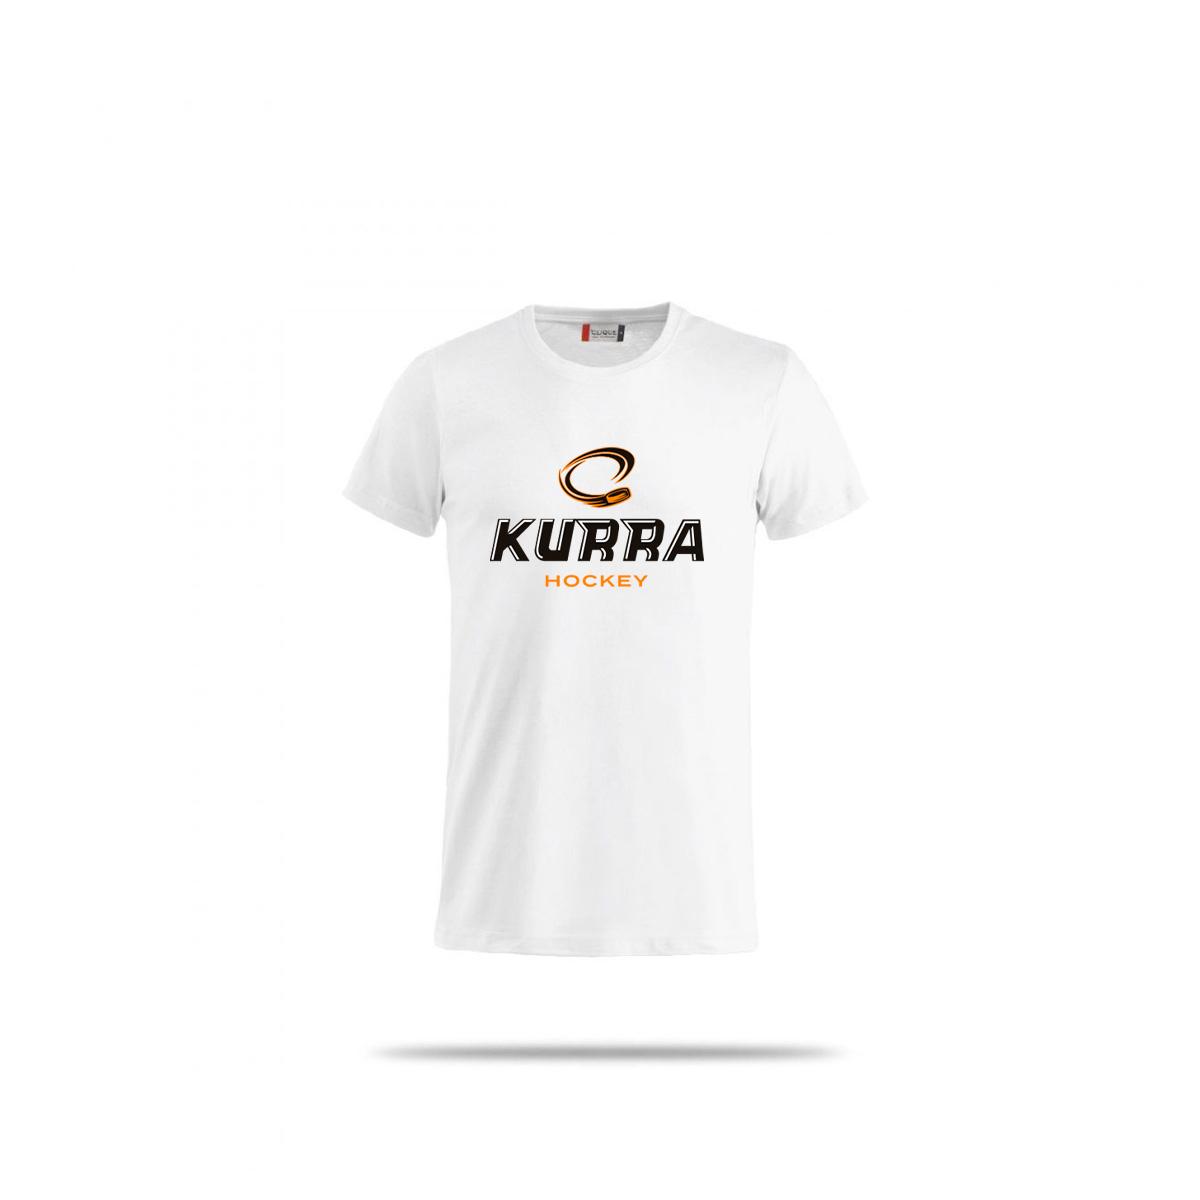 Kurra-Text-3025-valkoinen